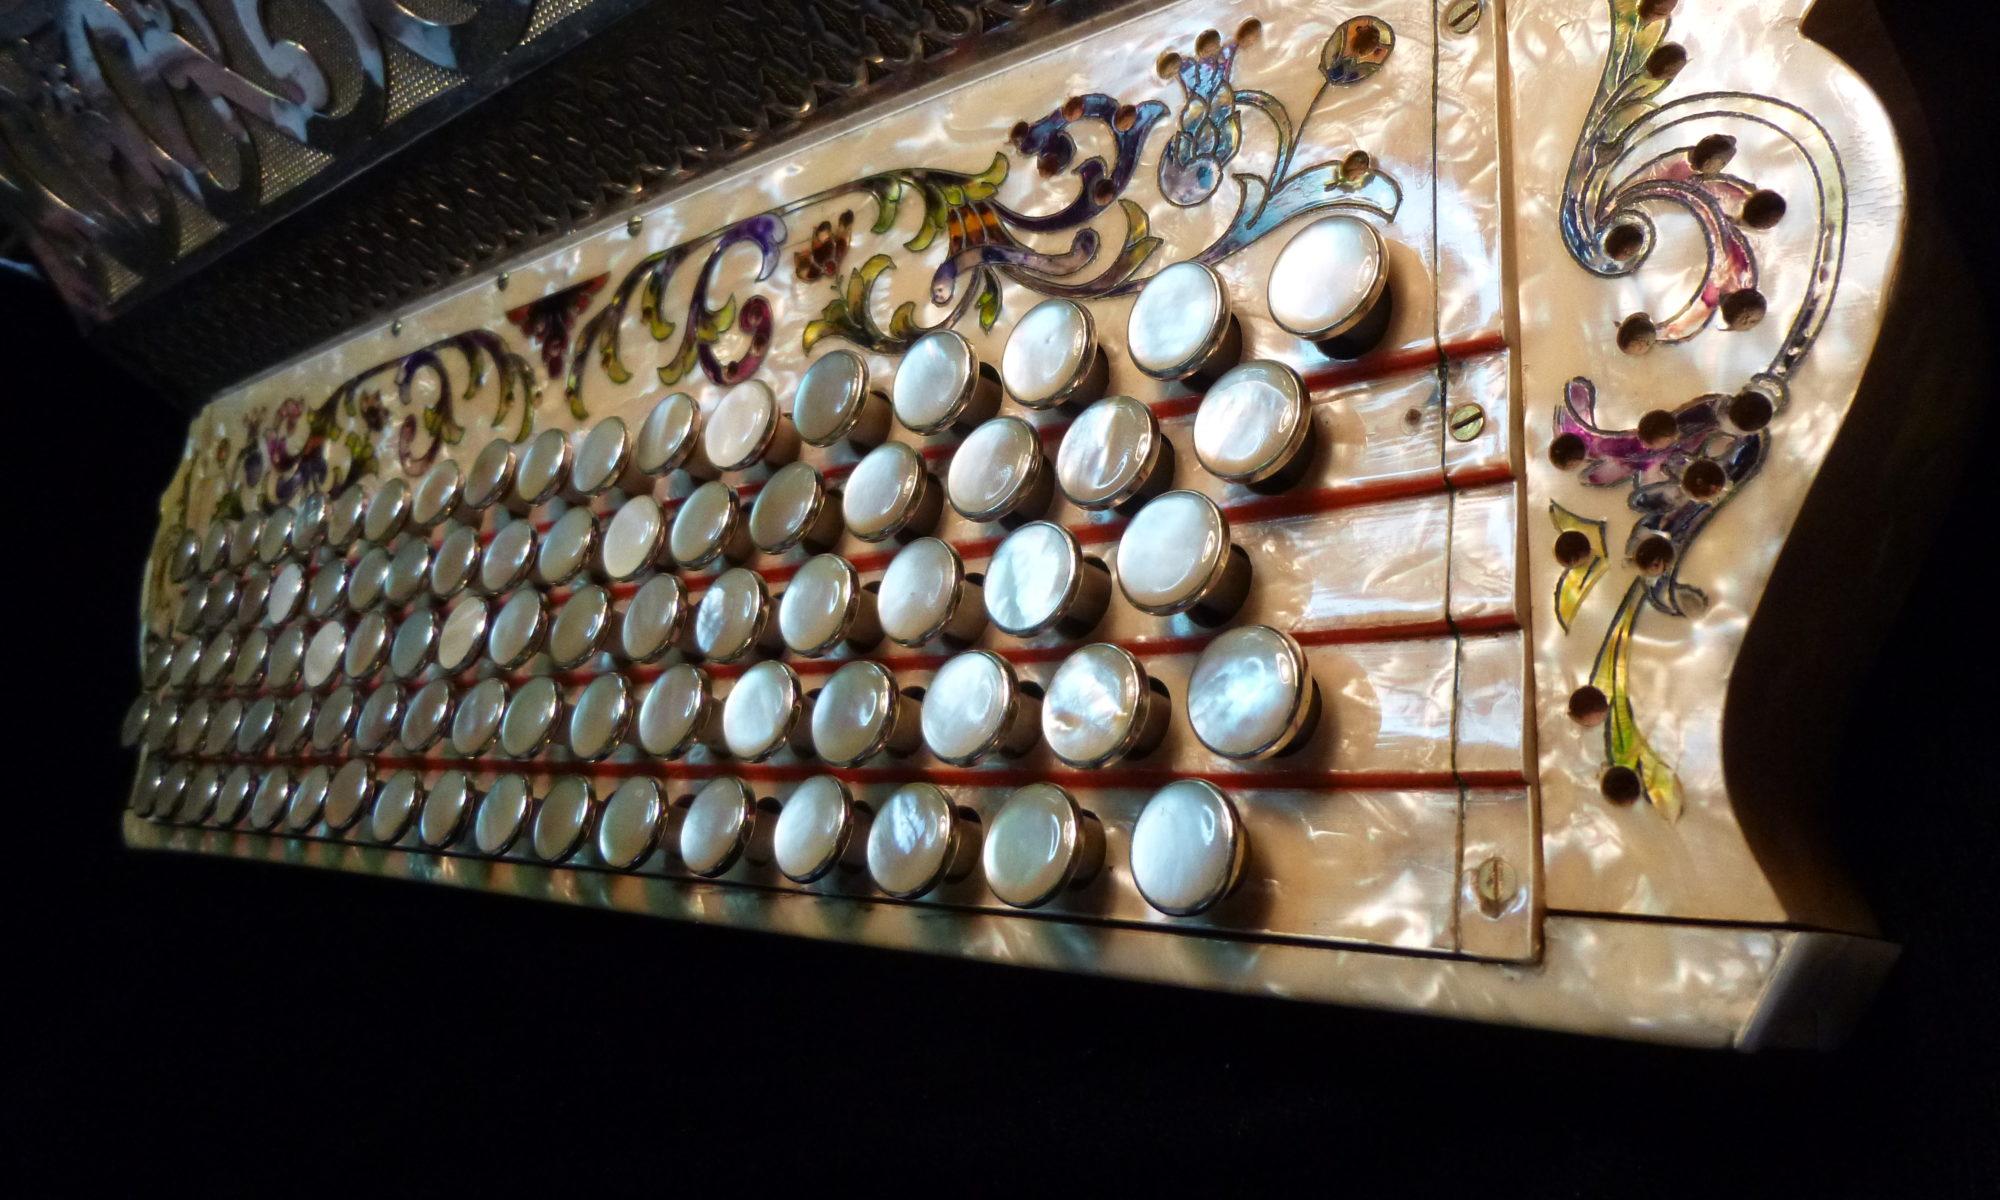 L'atelier de l'accordéon à dijon